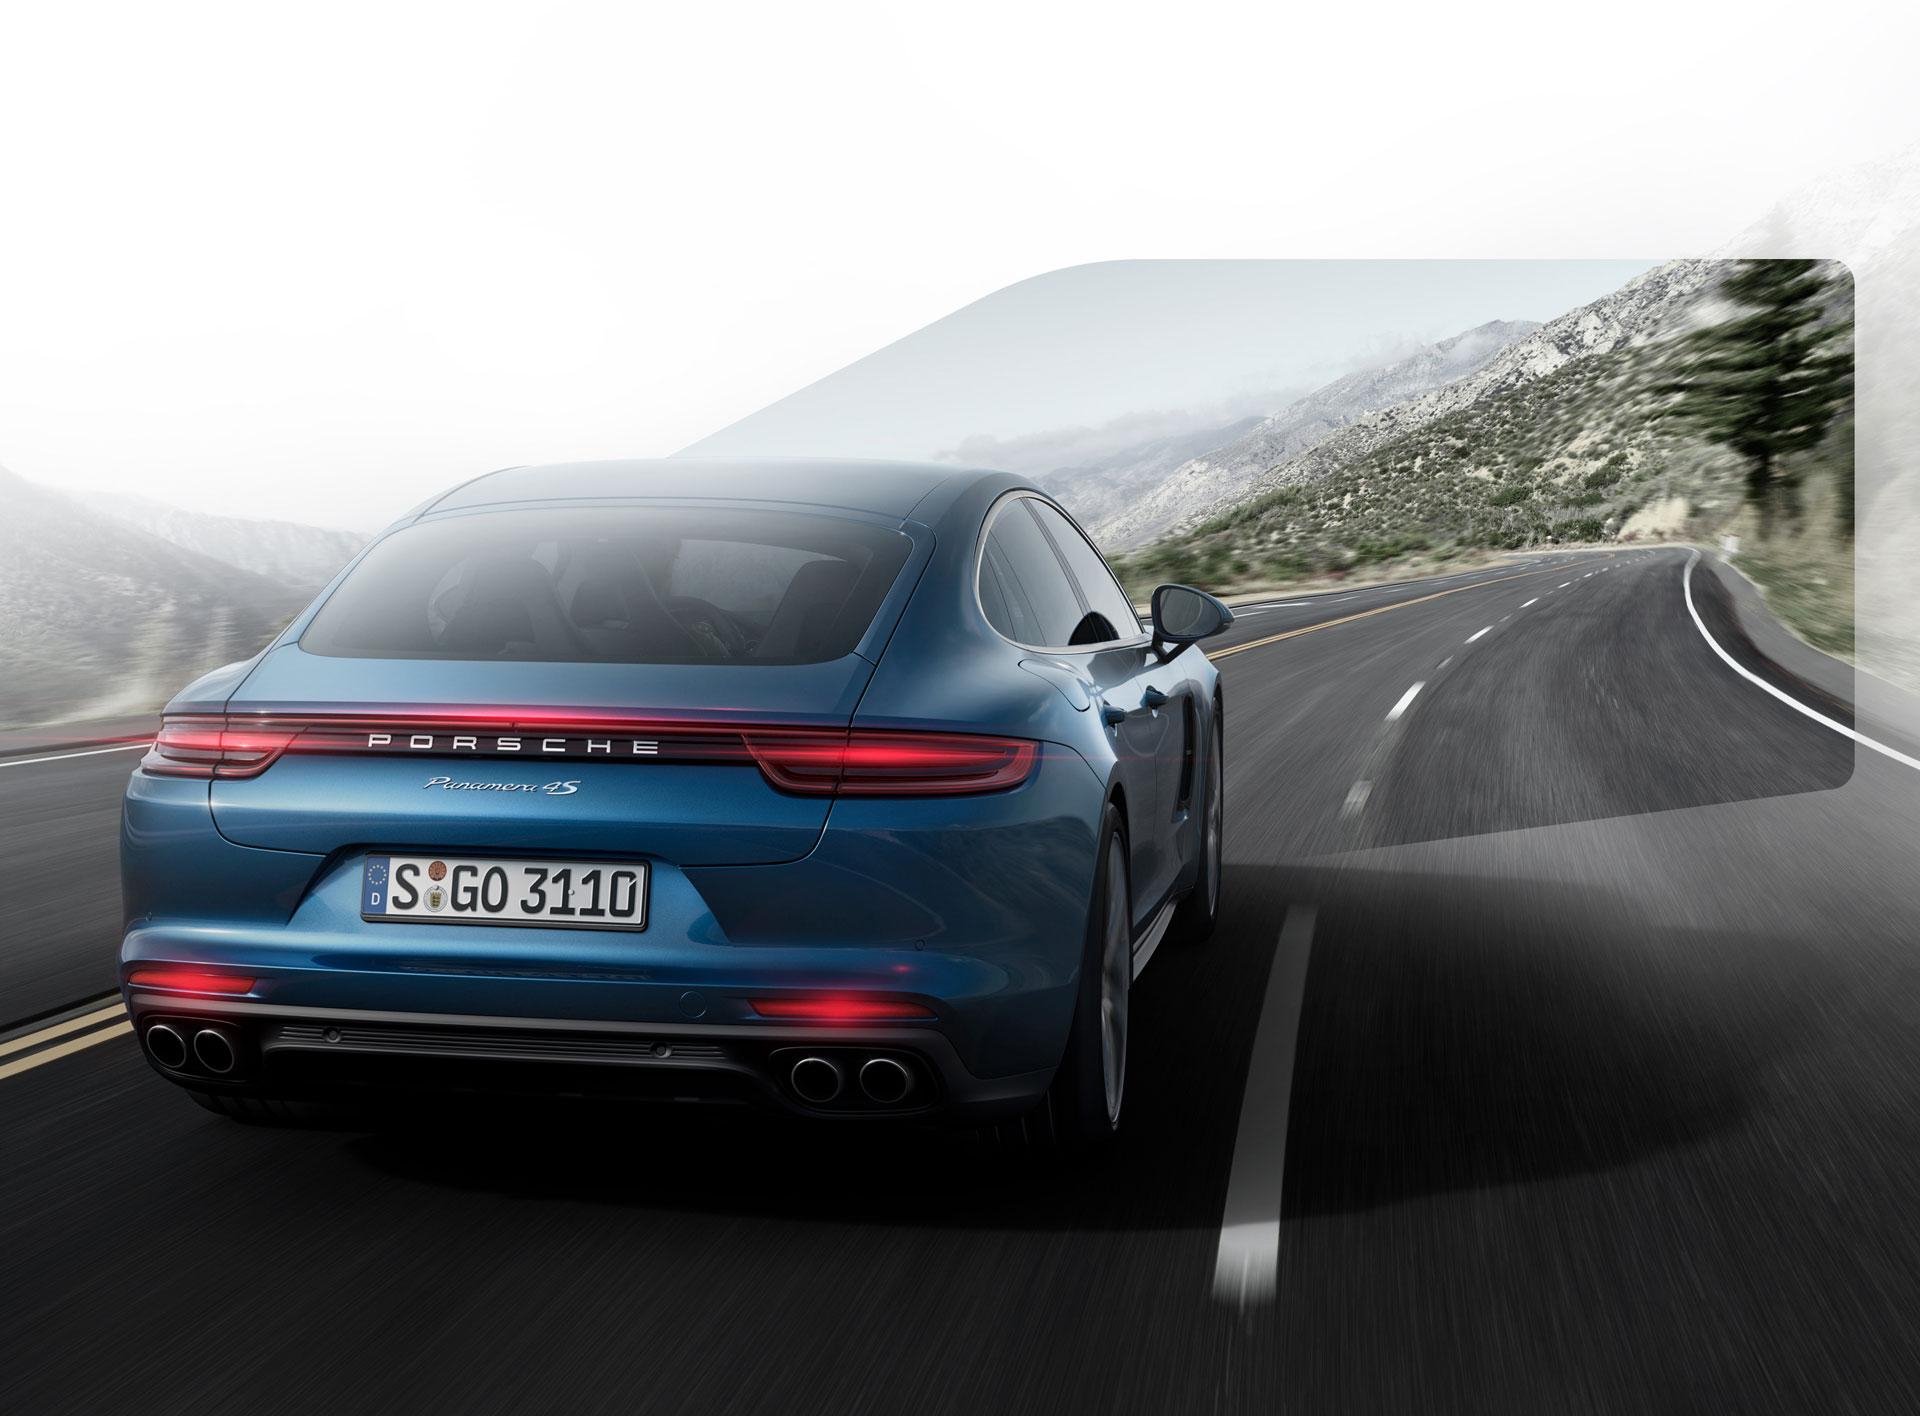 Porsche revs up driverless car efforts with TriEye investment